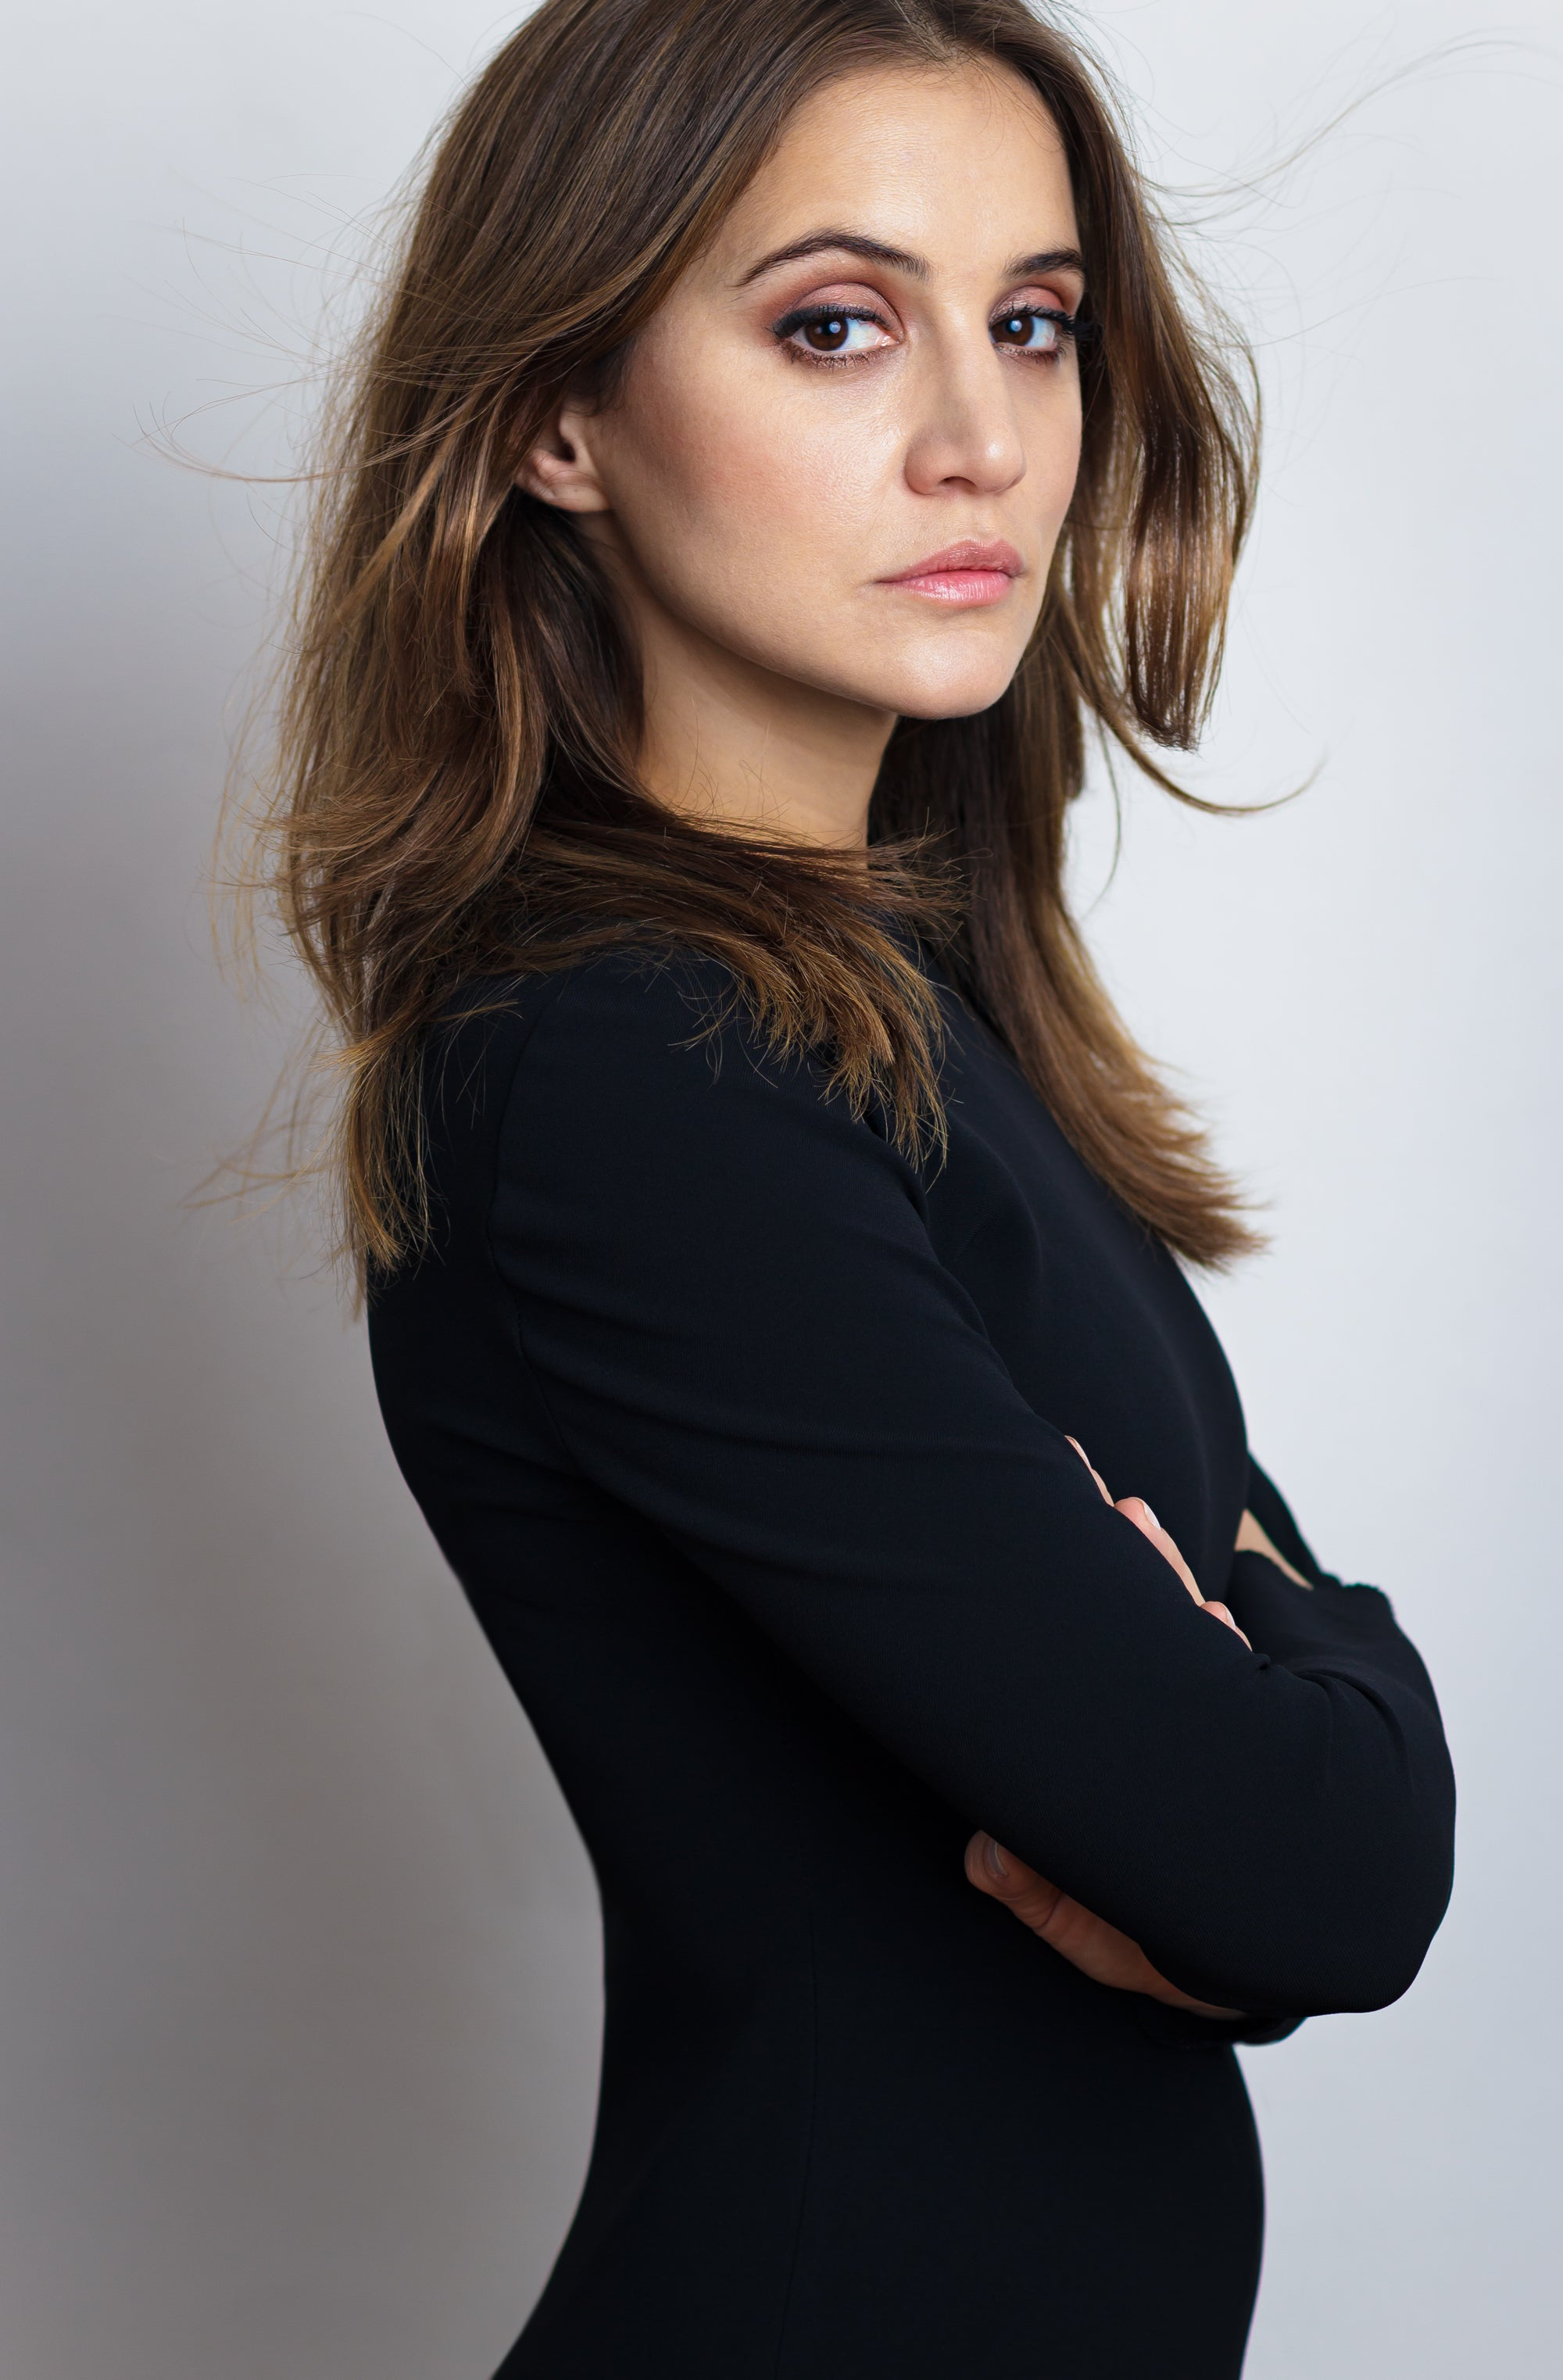 Actress Barbara Lombardo